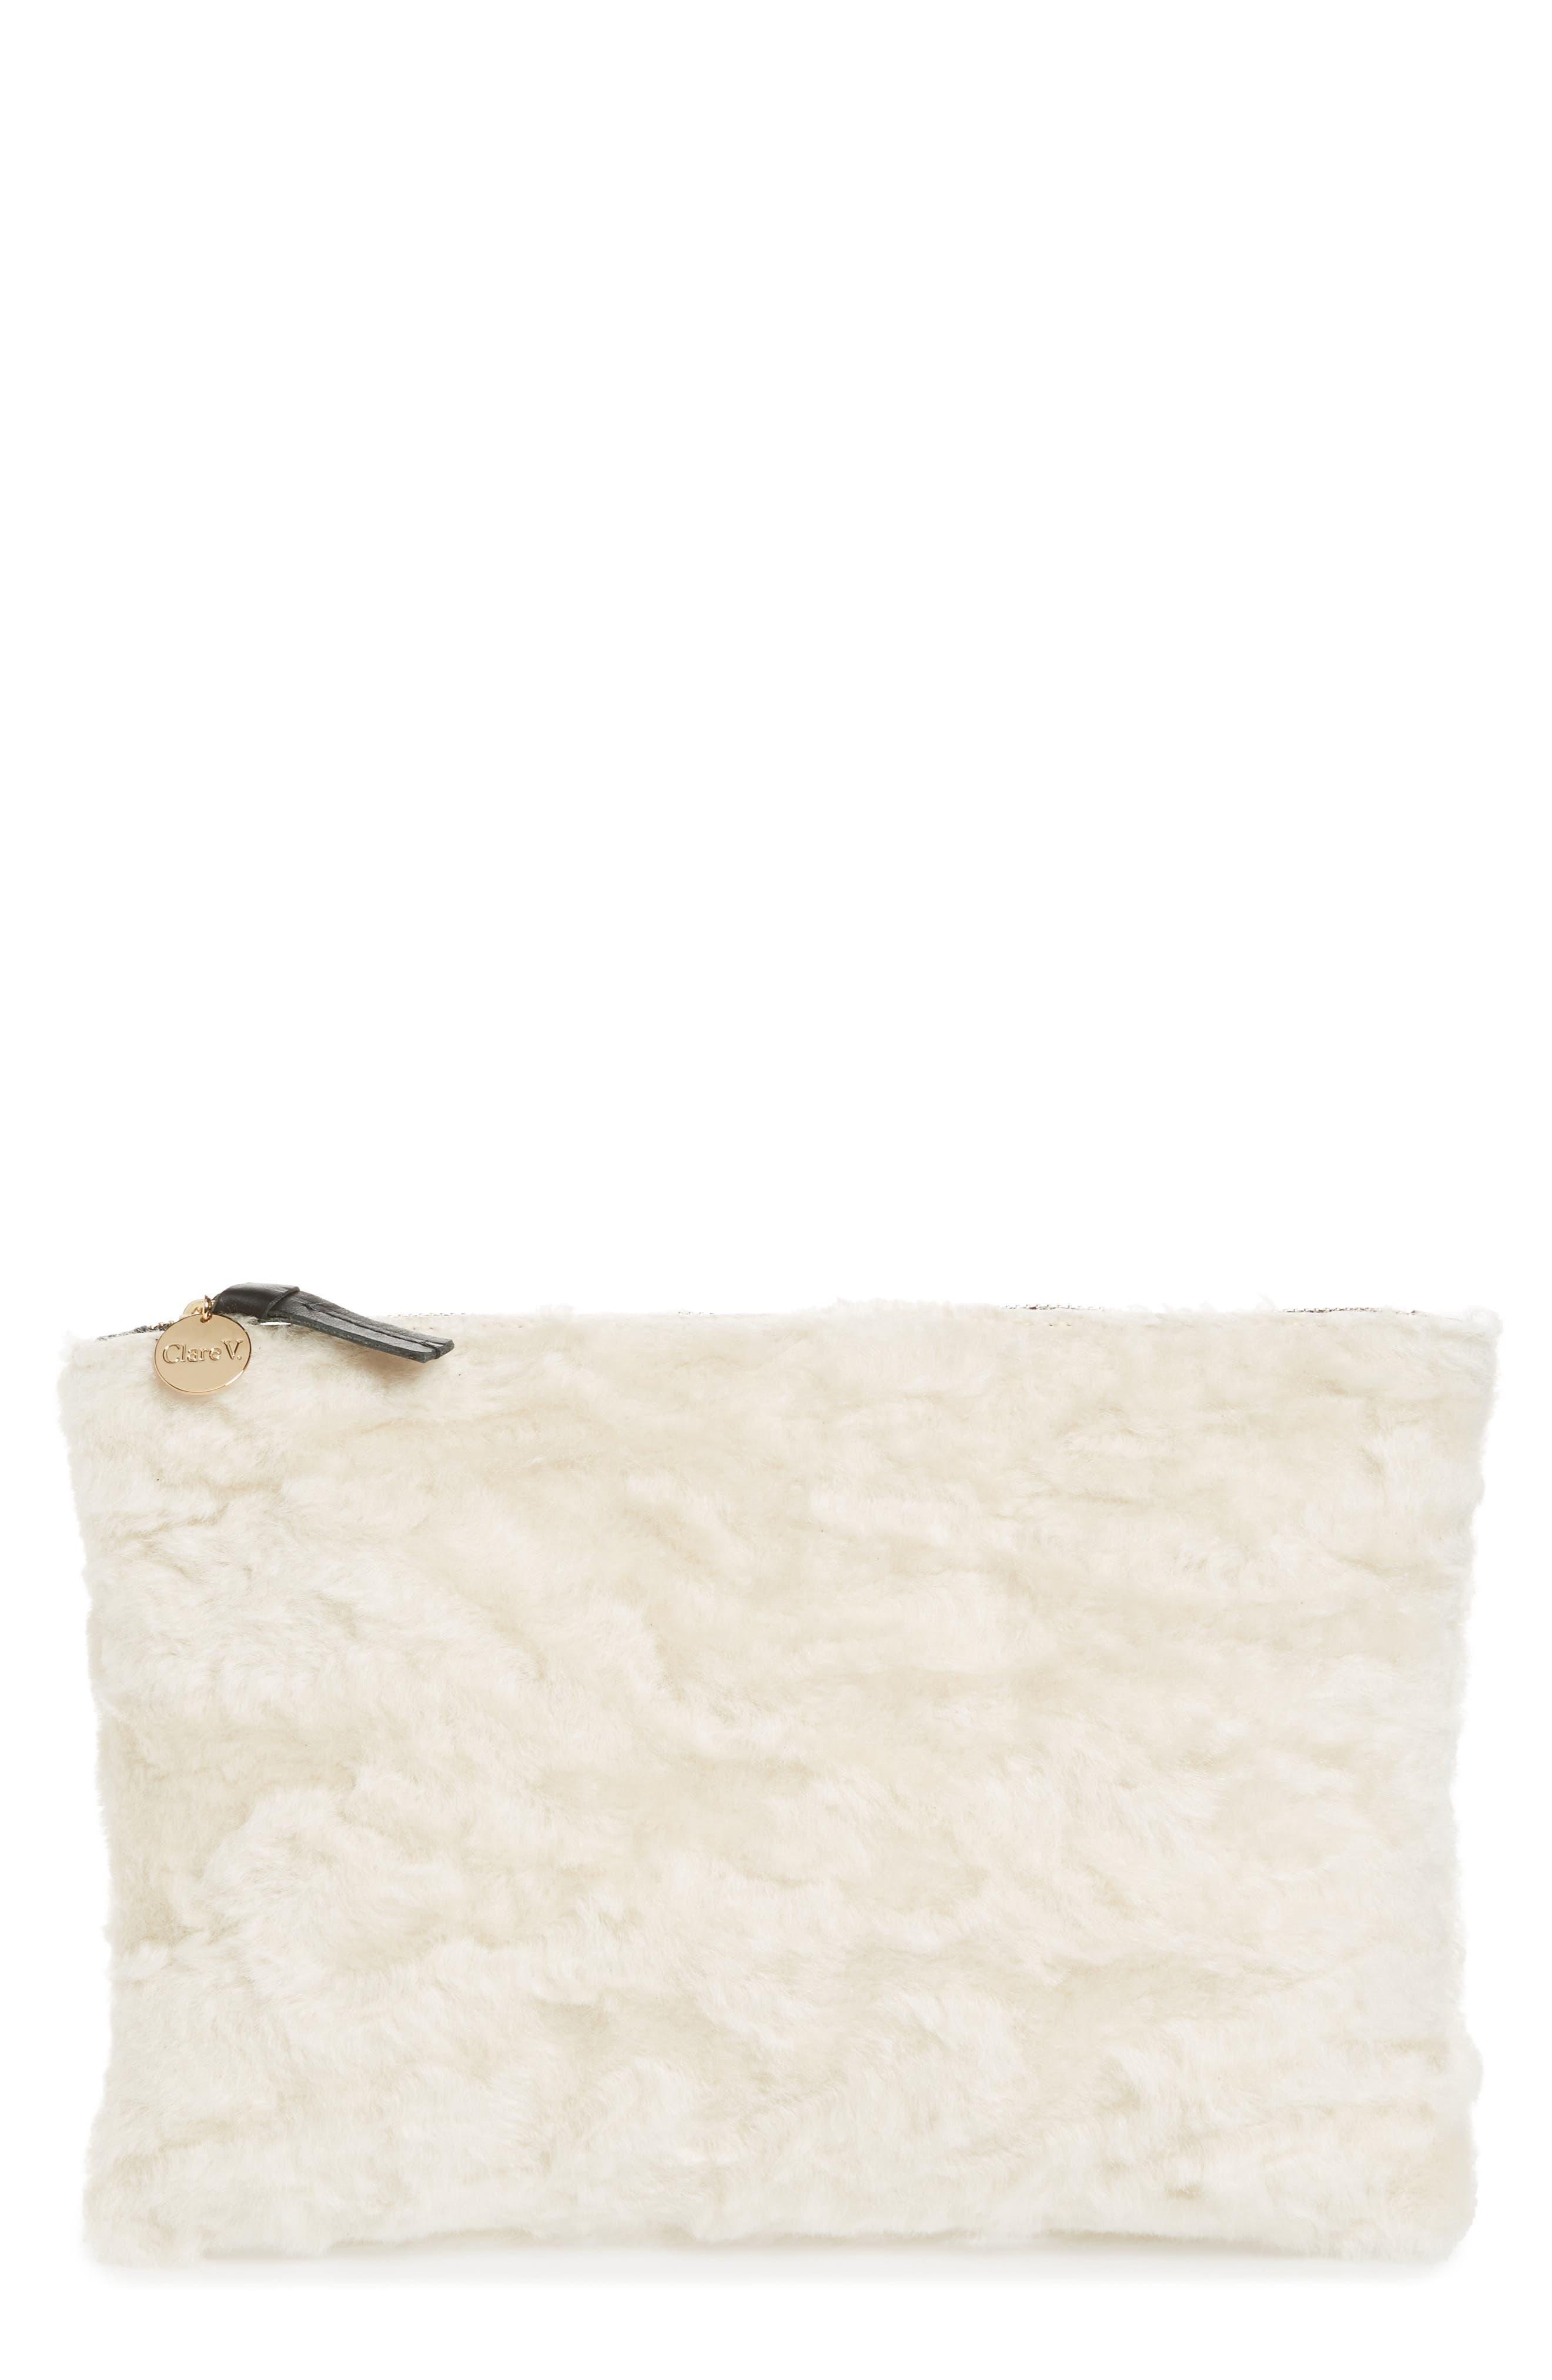 Genuine Shearling Flat Clutch,                         Main,                         color, Cream Shearling